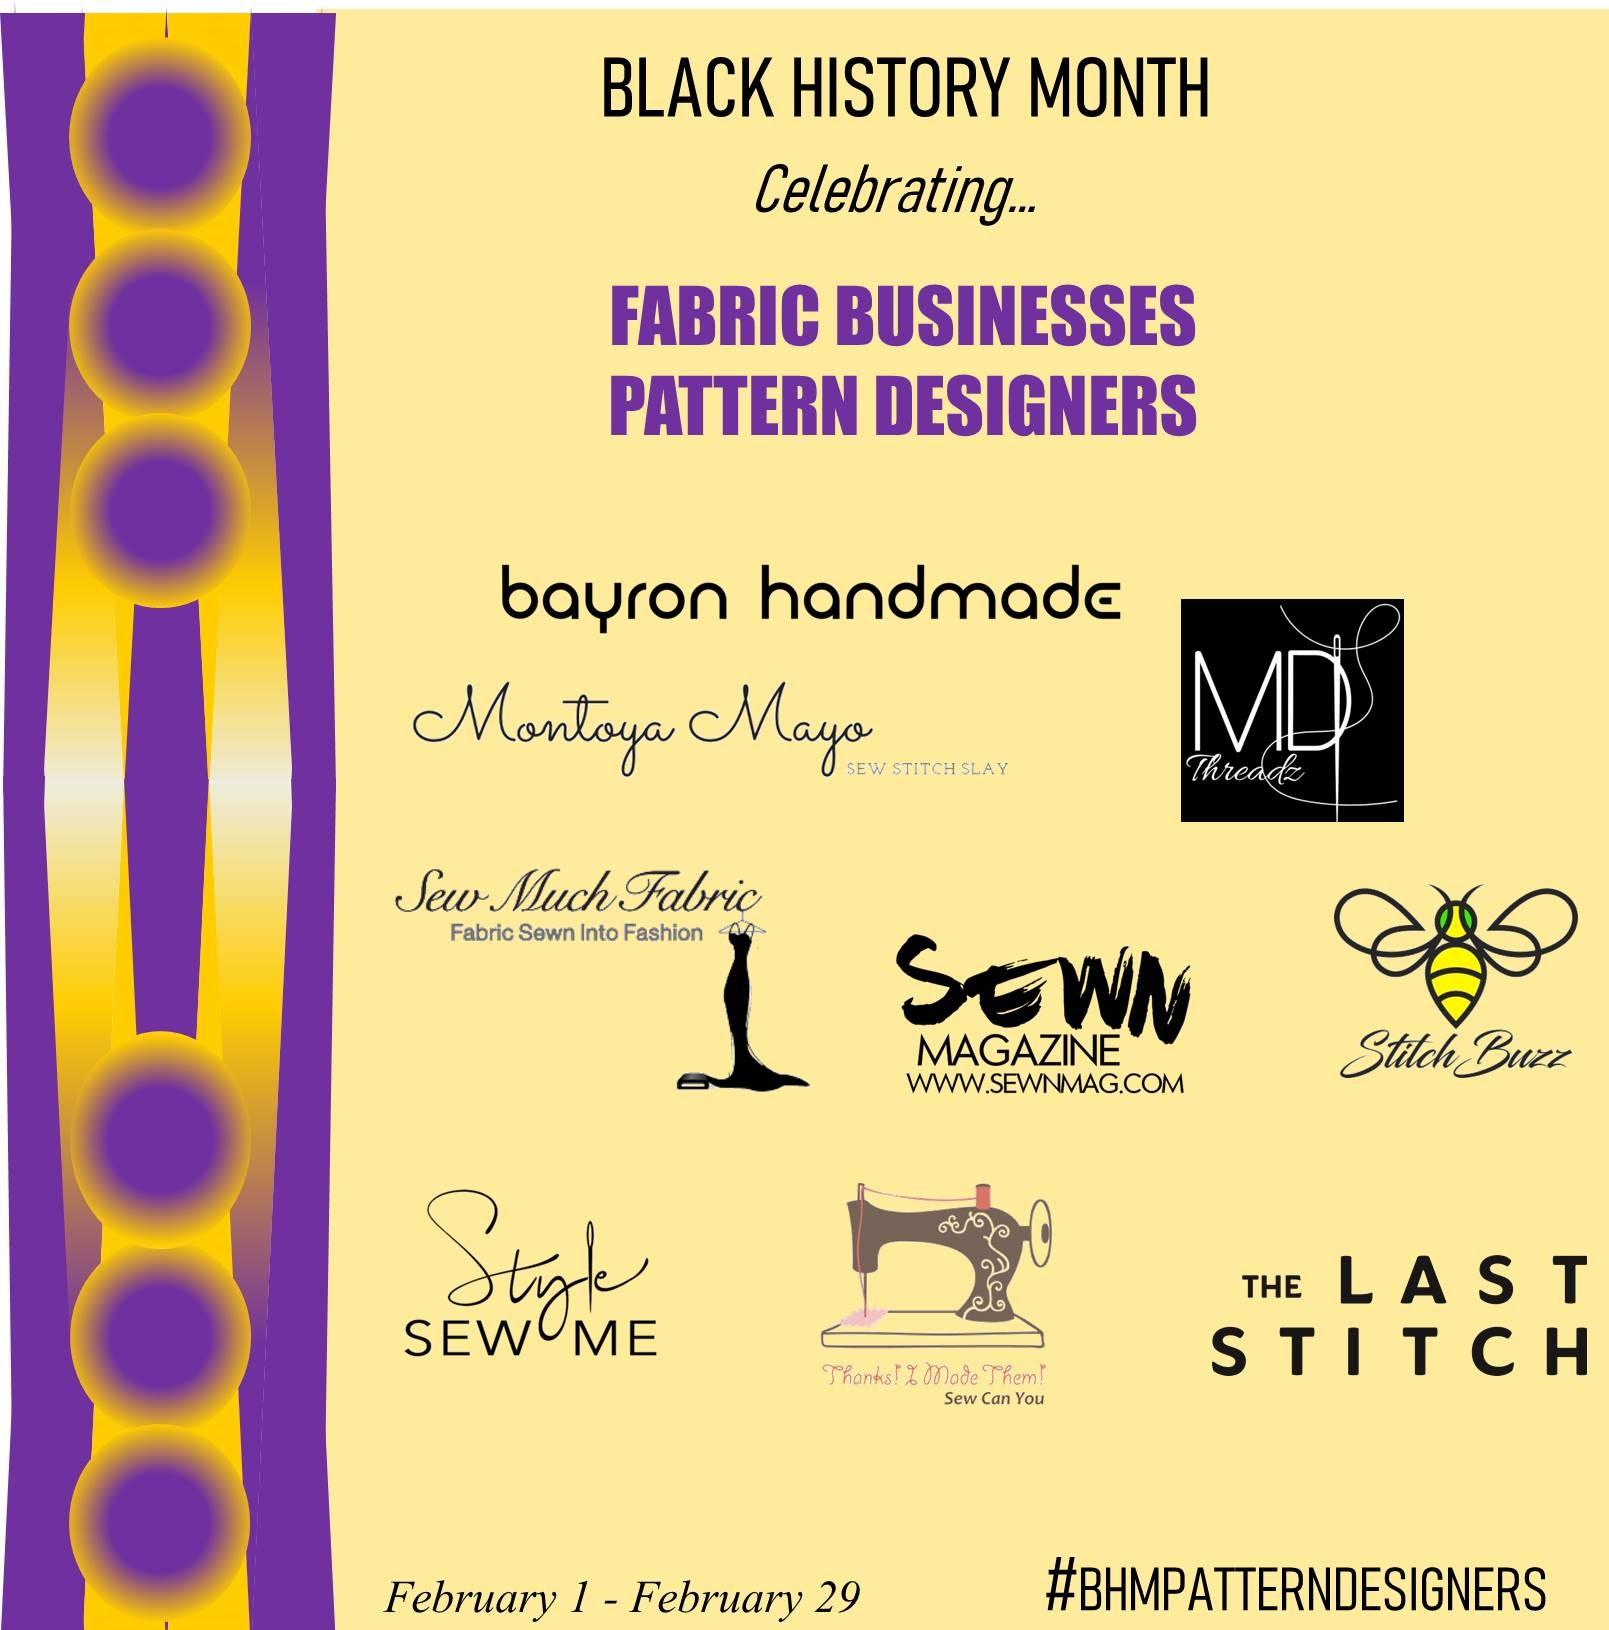 black-history-month-2020-bhmpatterndesigners-sponsor